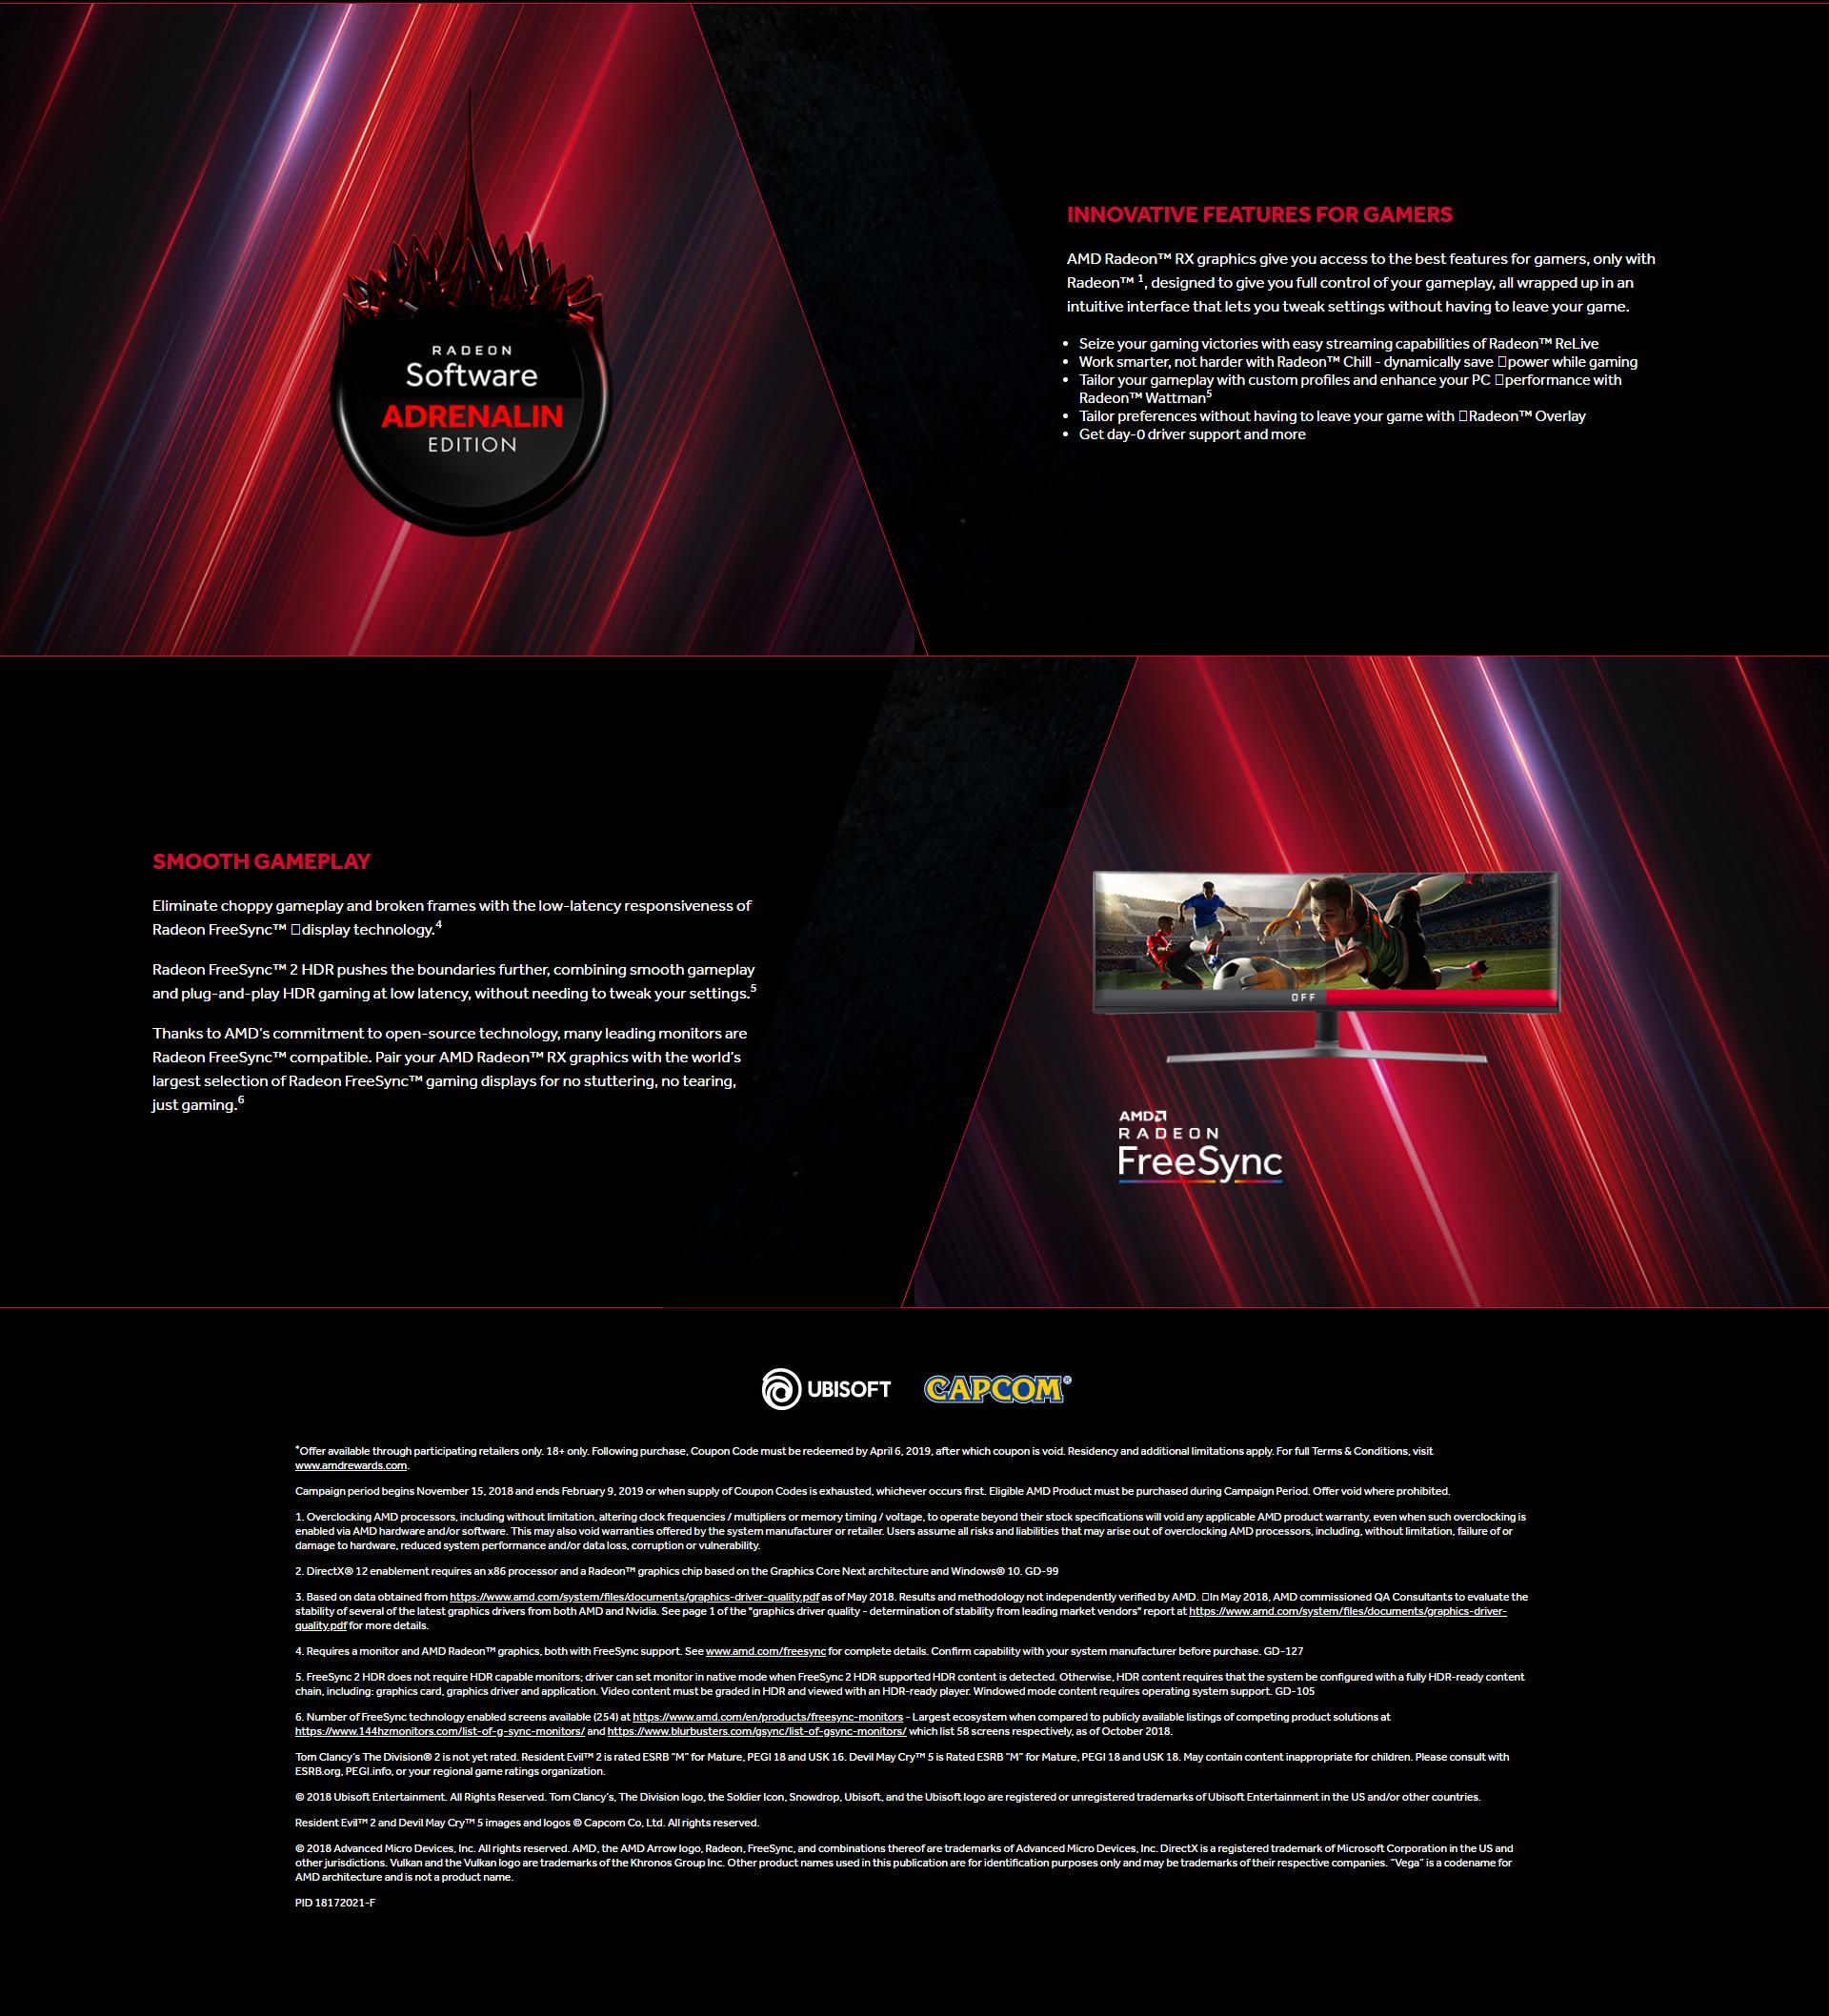 AMD-Raise-the-Game: iBUYPOWER®